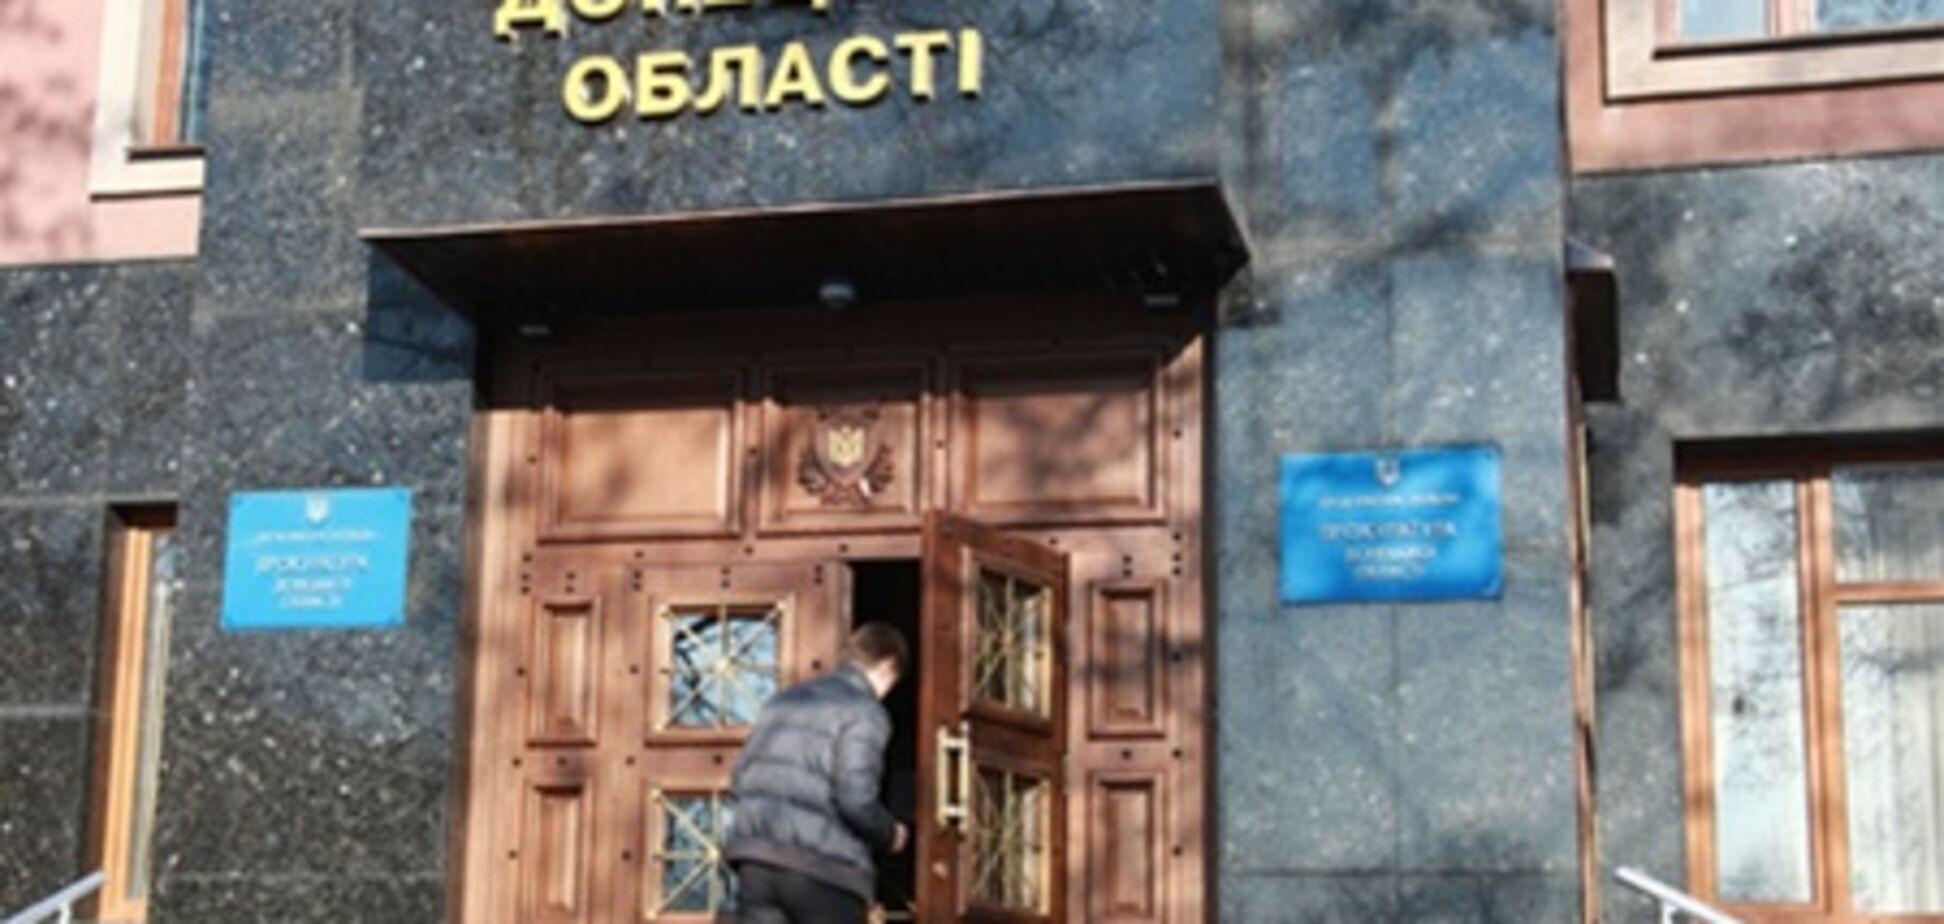 Прокуратура взялась за Донецкий университет